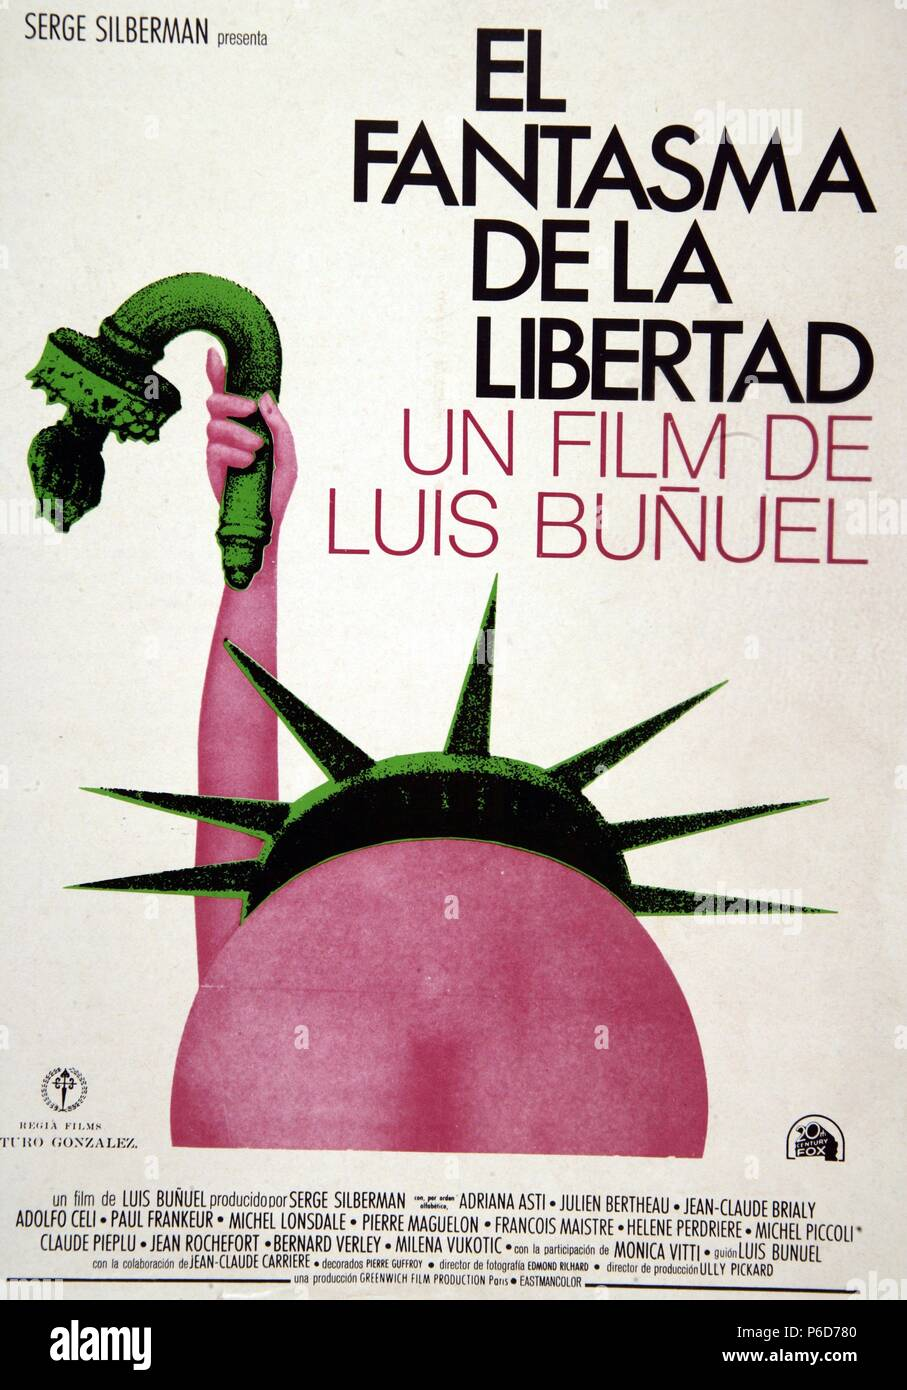 PELICULA : EL FANTASMA DE LA LIBERTAD , 1974. Direttore : Luis Buñuel. ACTORES : Adriana Asti , JULIEN BERTHEAU. PRODUCCIO : FRANCIA E ITALIA. Immagini Stock